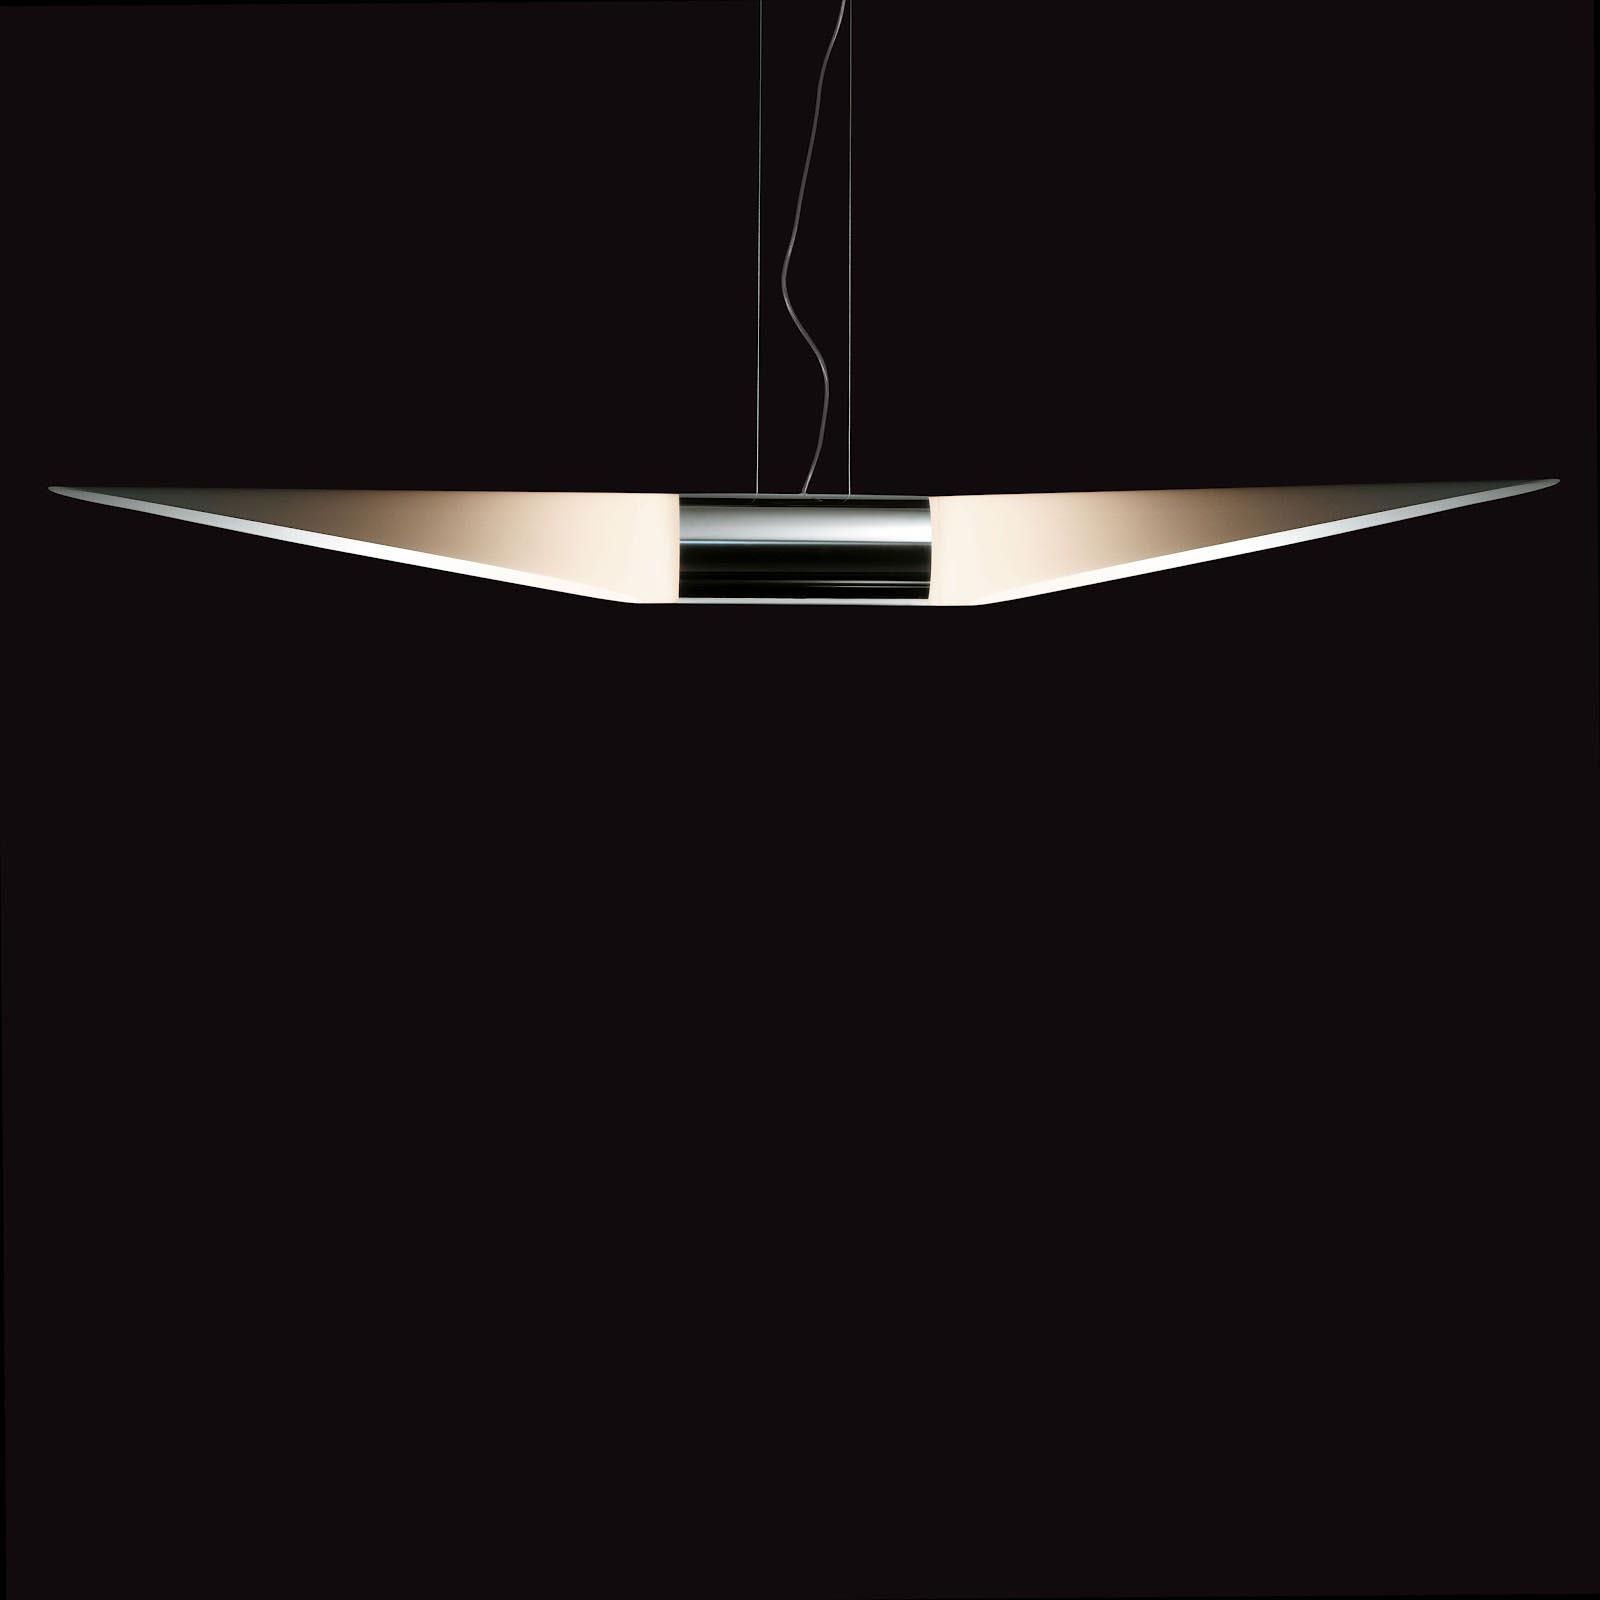 Office pendant lighting fixtures light fixtures design ideas - Lit confortable design ...